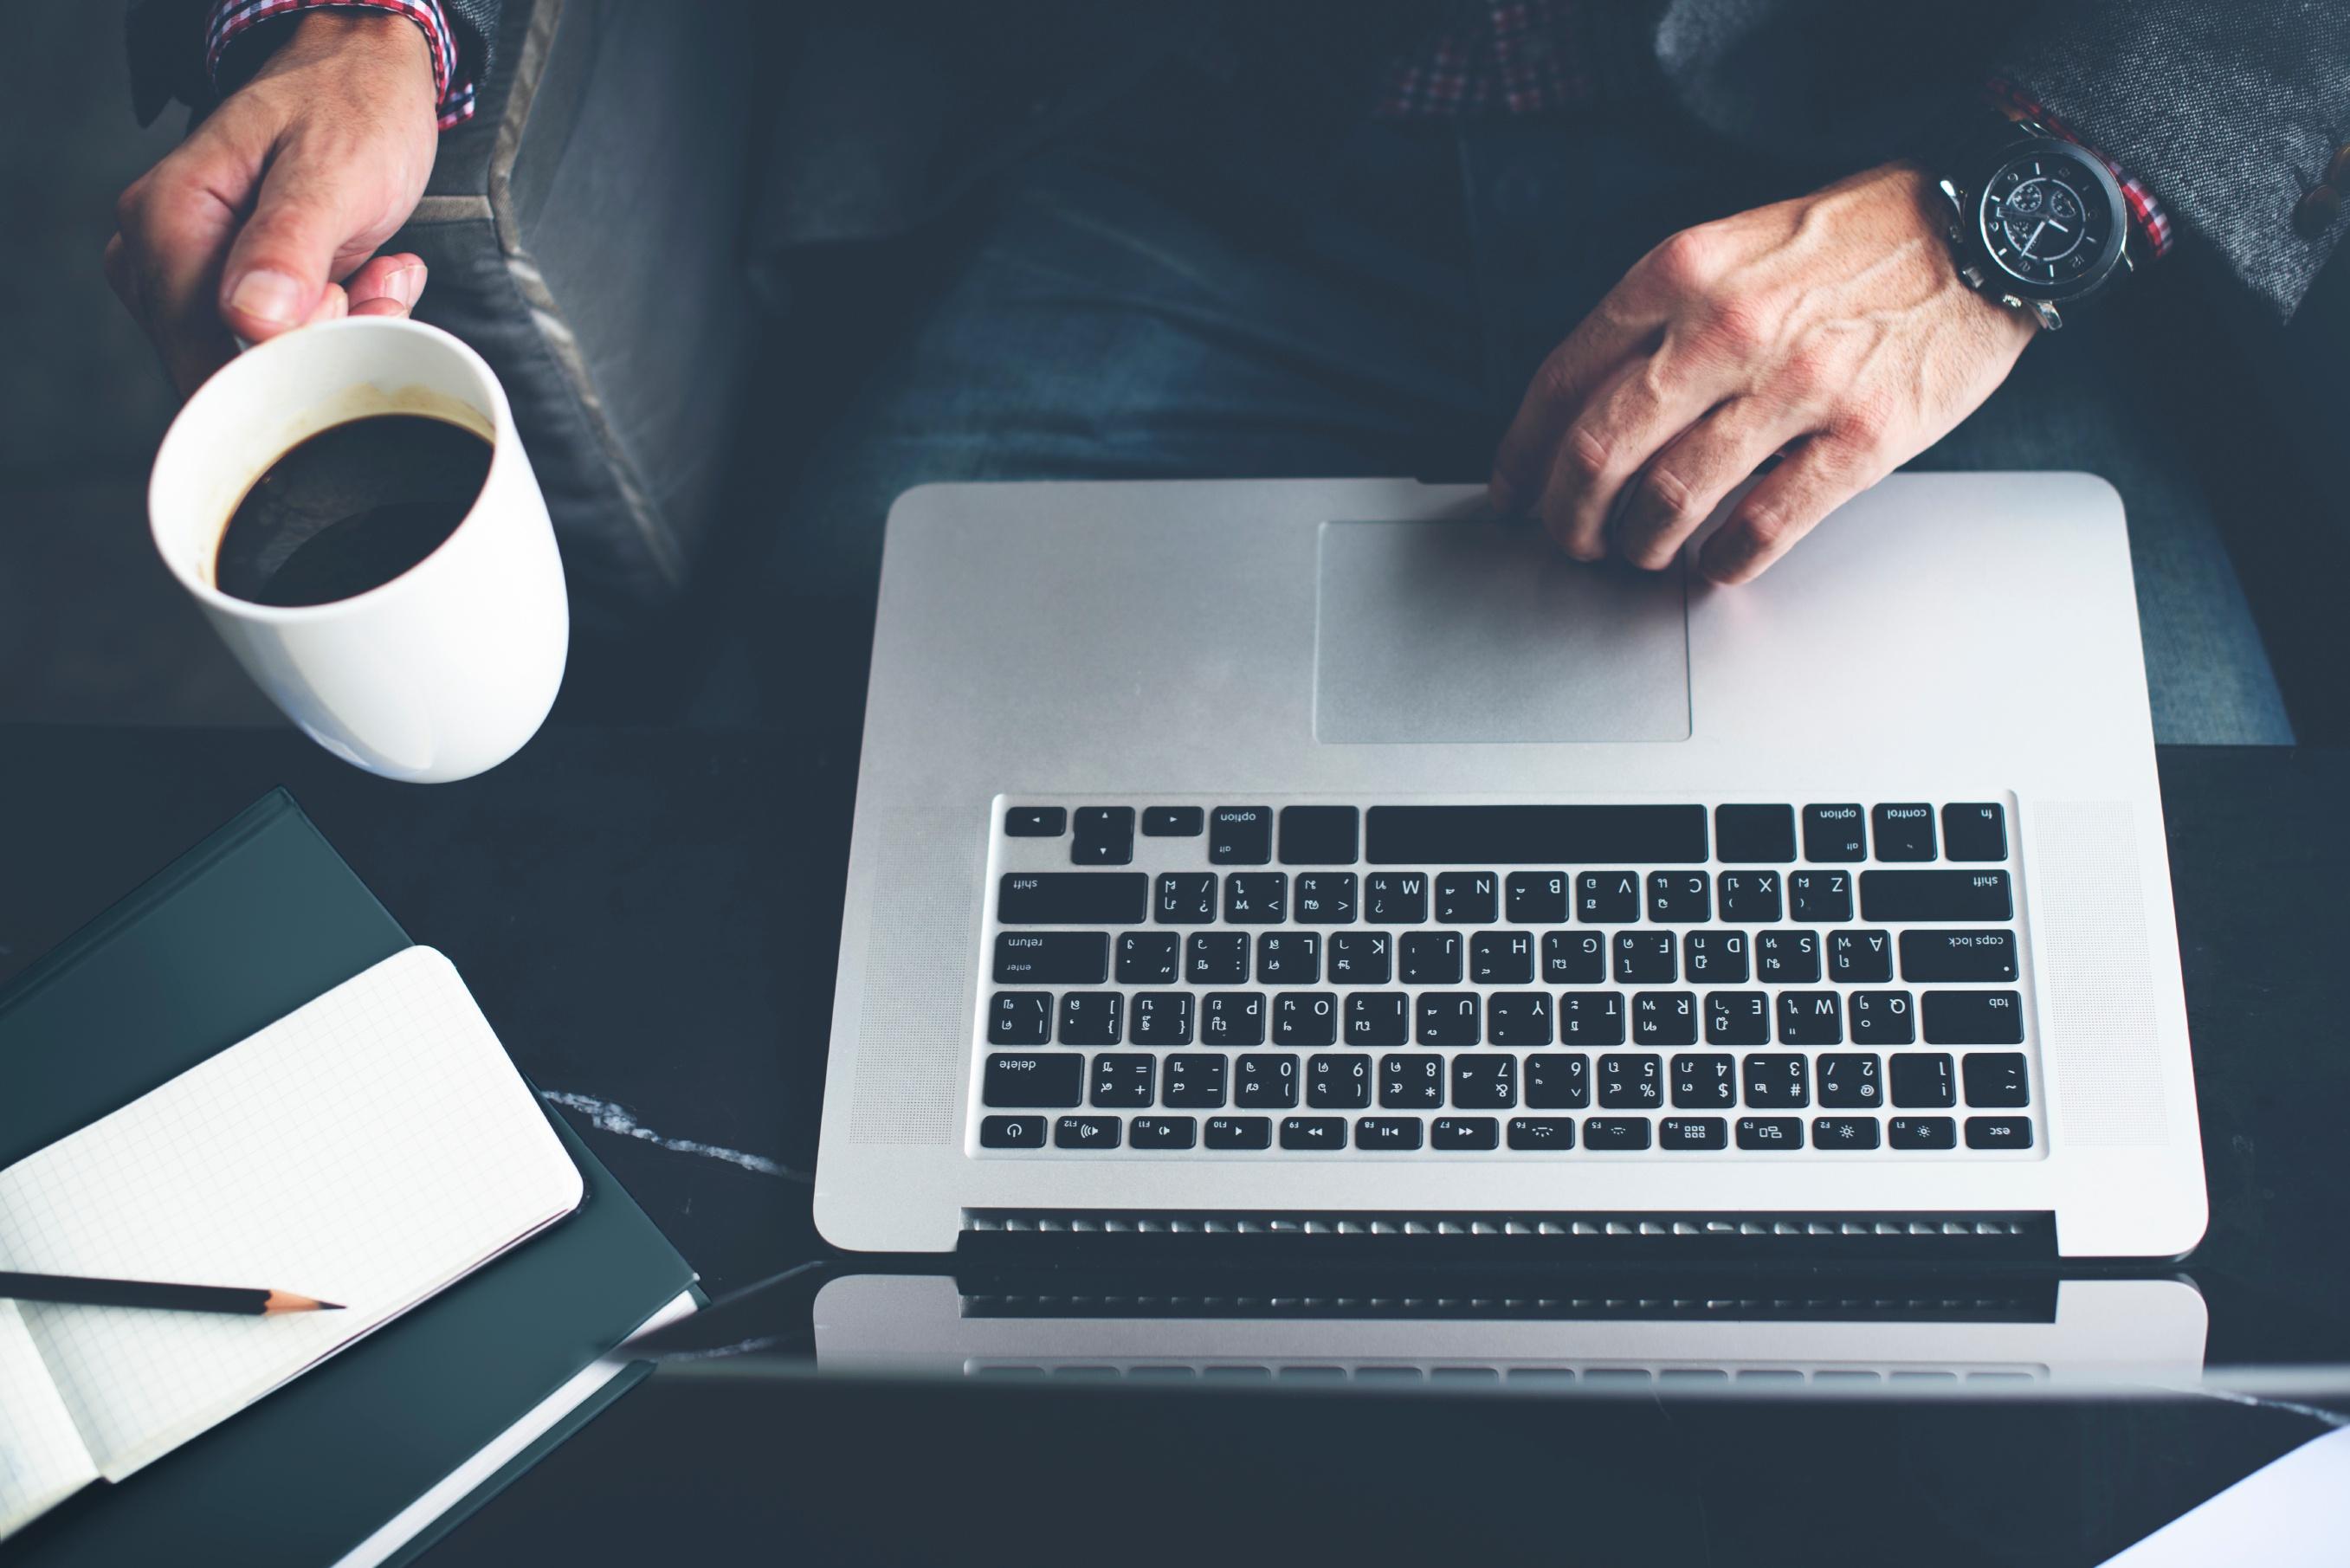 Man-Computer-Laptop-Coffee-Cafe-Concept-000079551979_Large.jpg